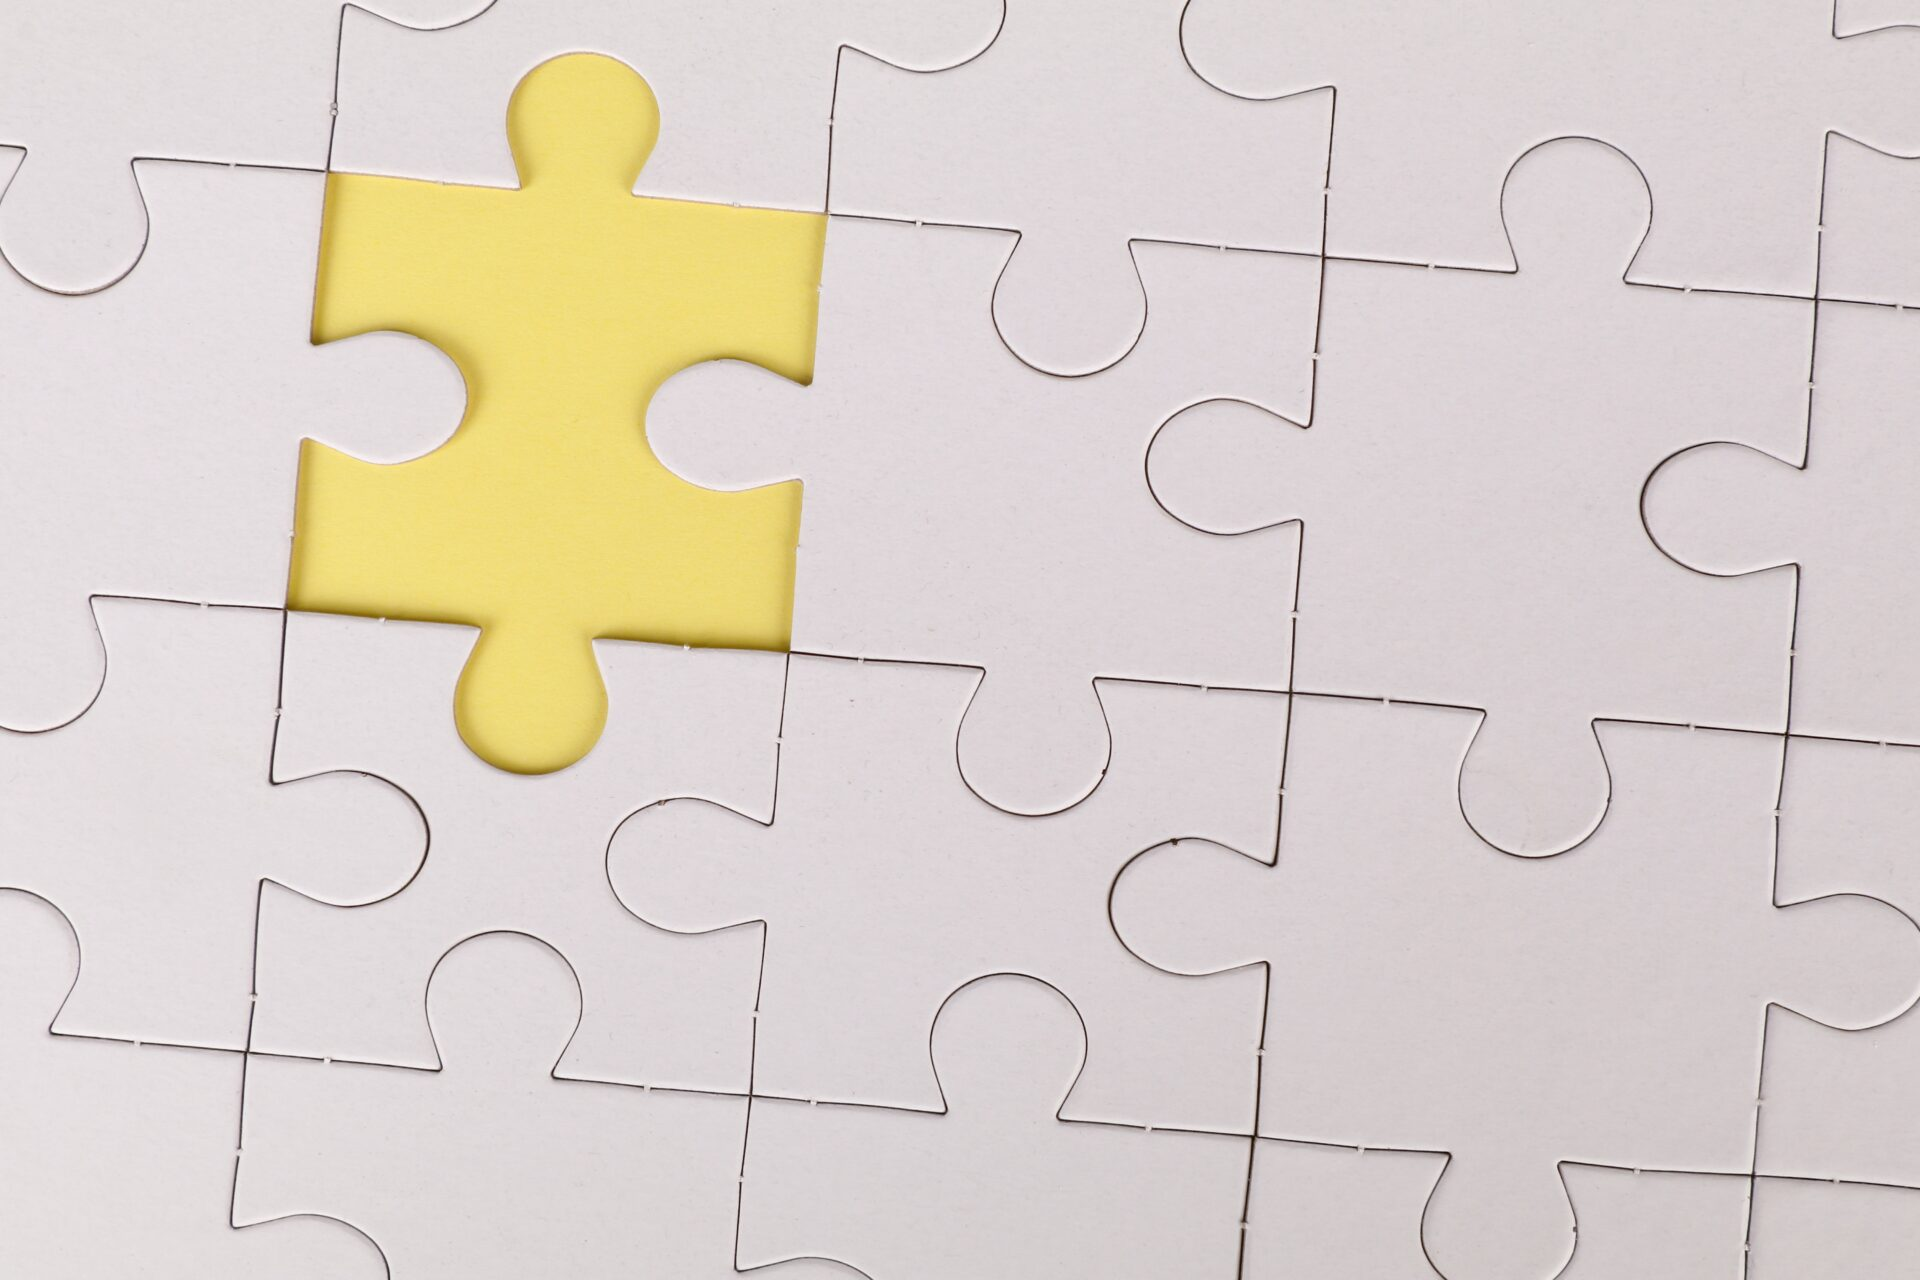 A plain white jigsaw missing a piece (Photo by Ann H on Pexels.com)